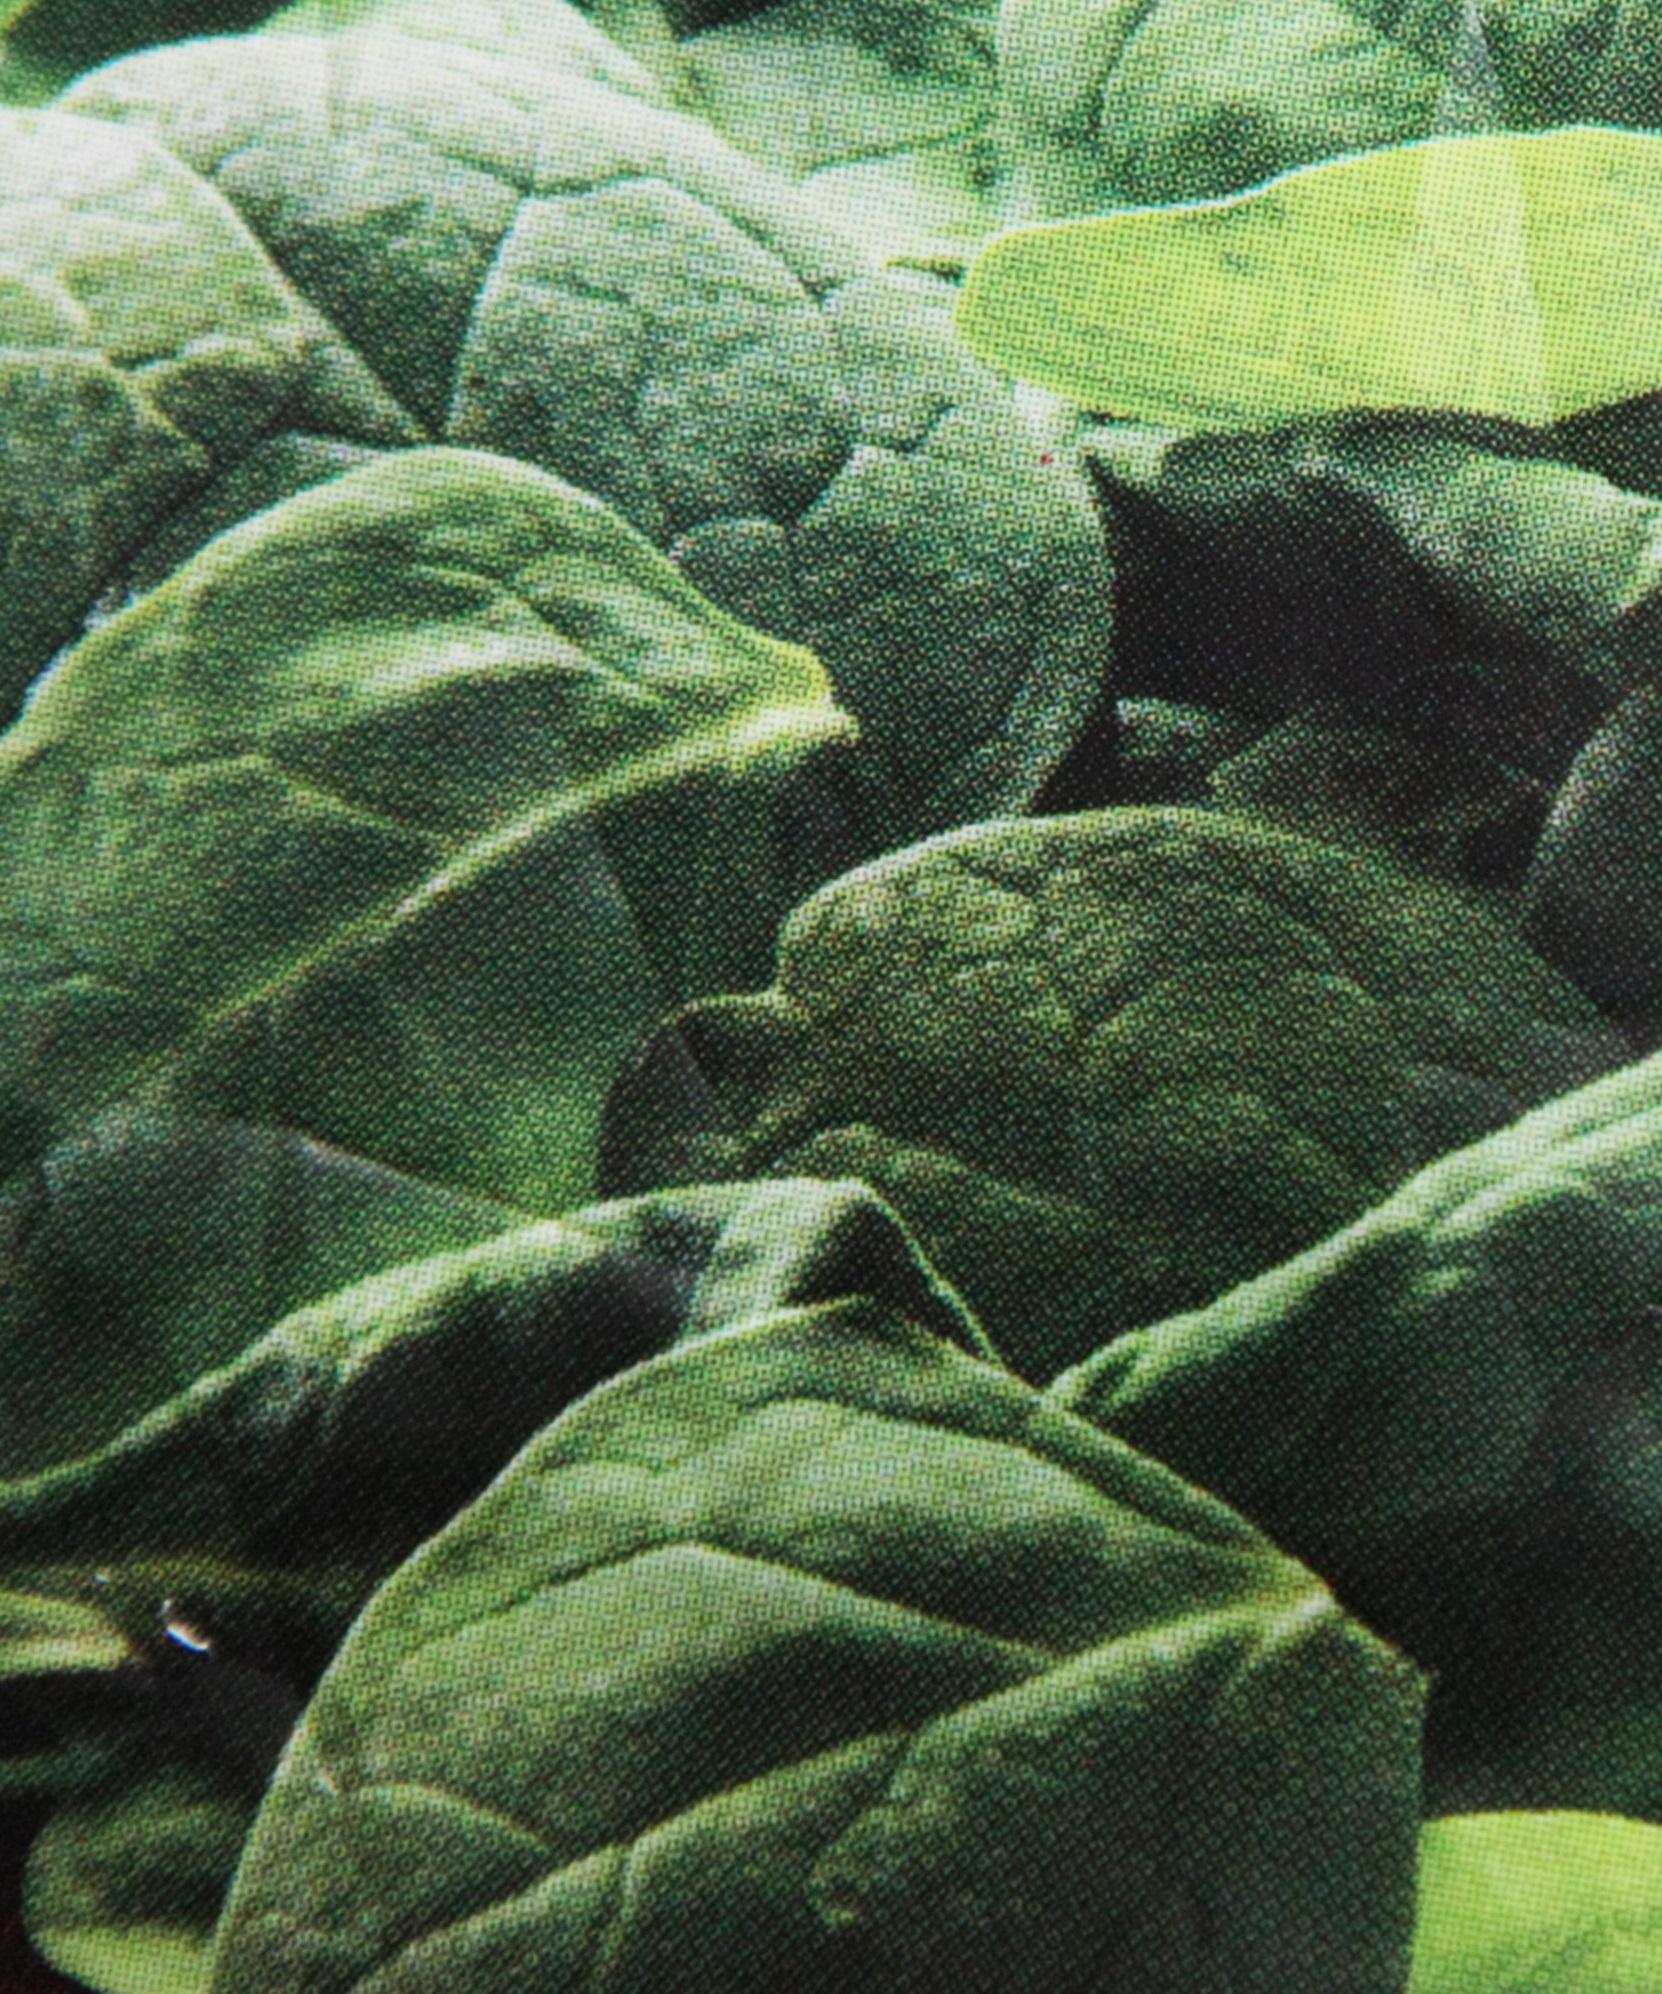 Spinach - Agrisera antibodies